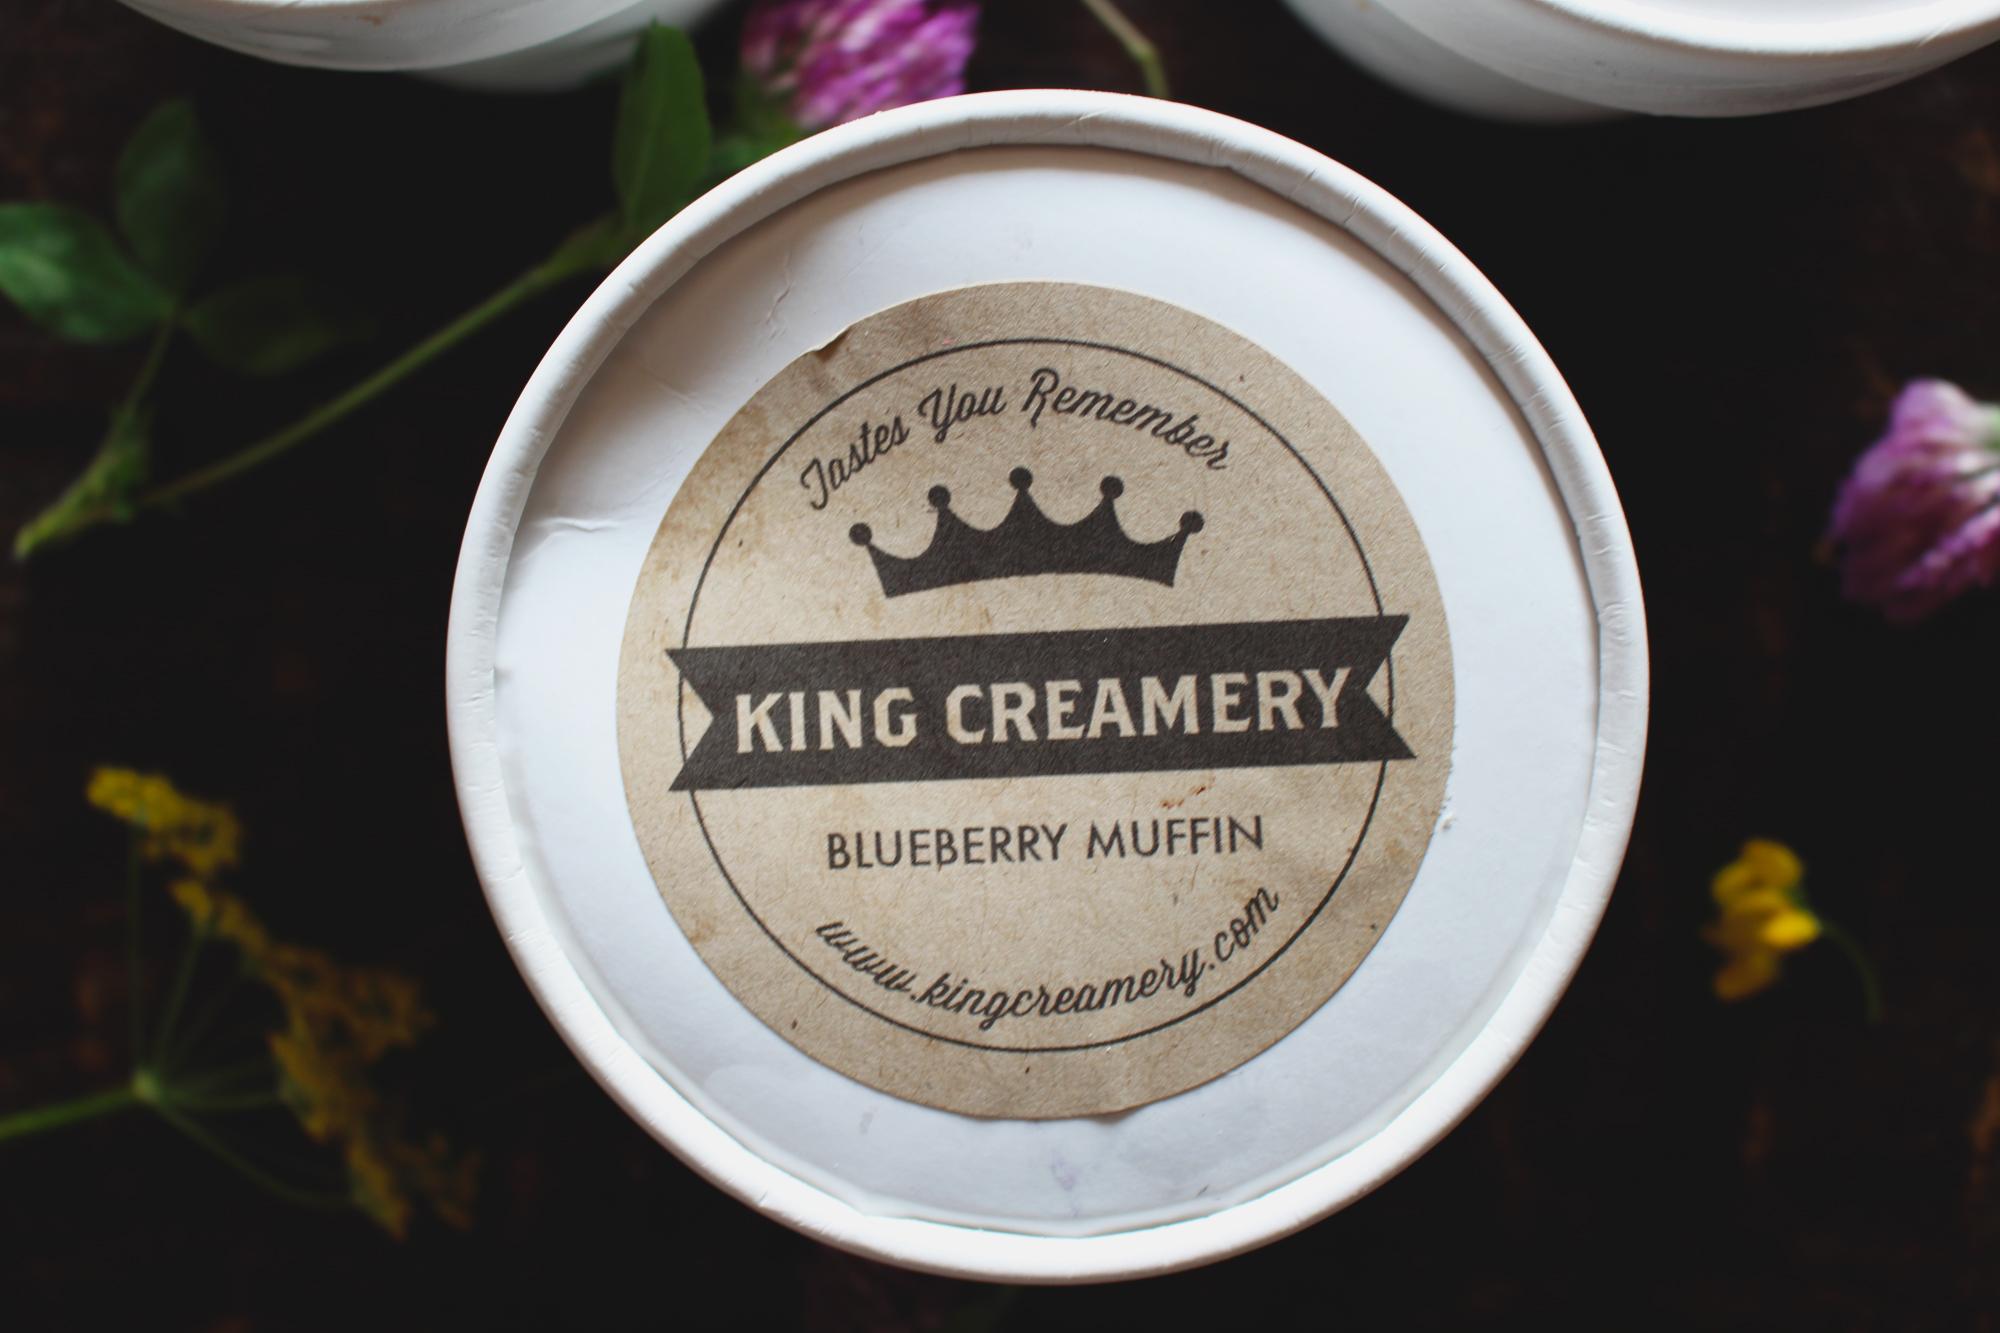 Blueberry Muffin Ice Cream